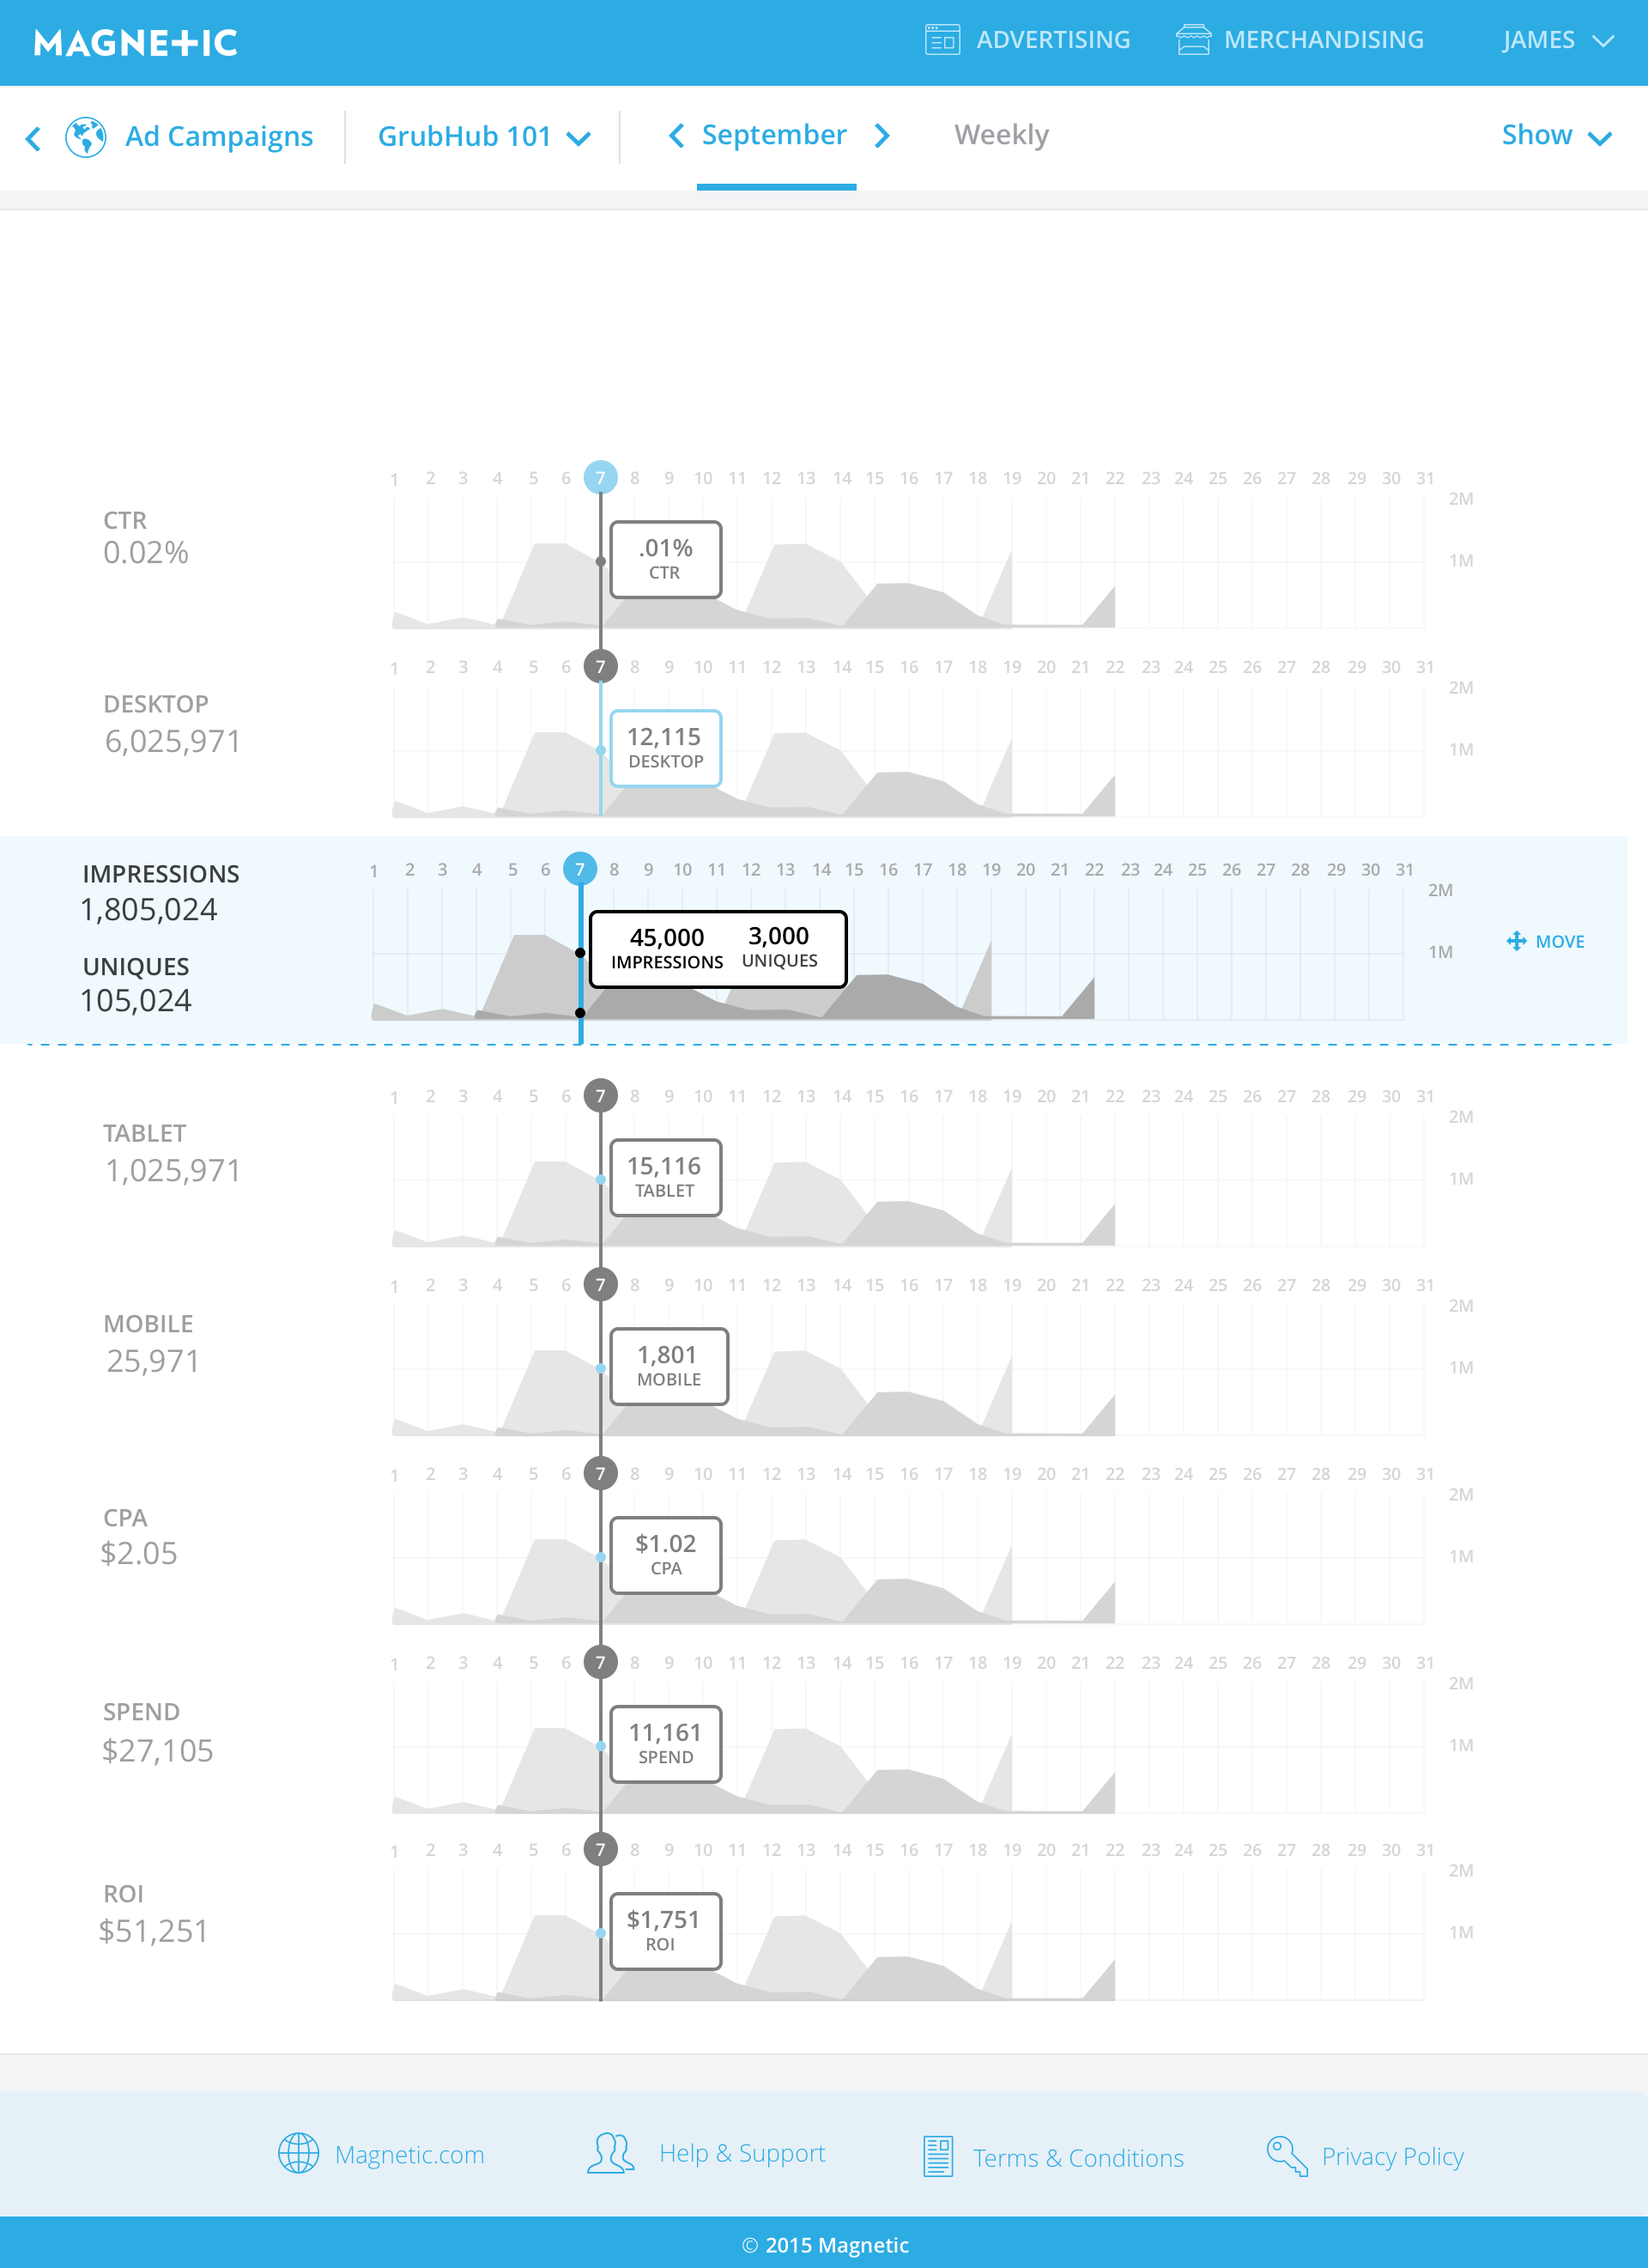 Dashboard (Charts) (Move).png